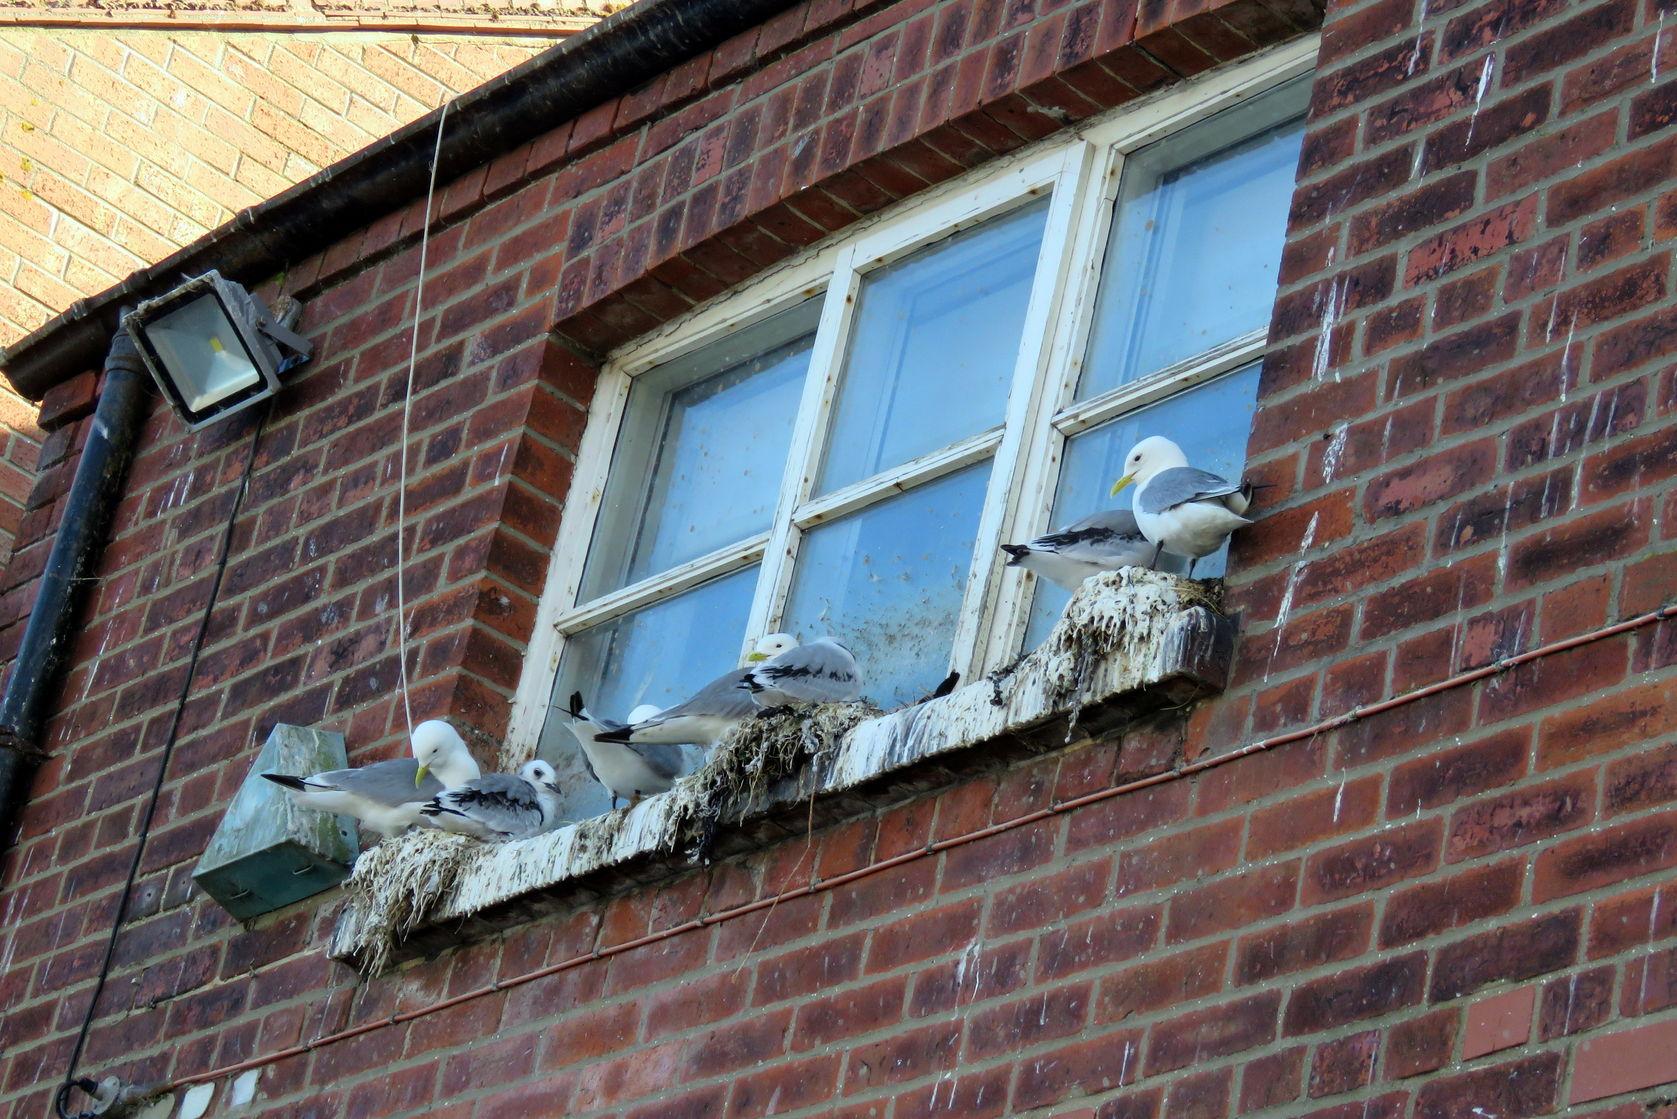 Pest seagulls nesting on house